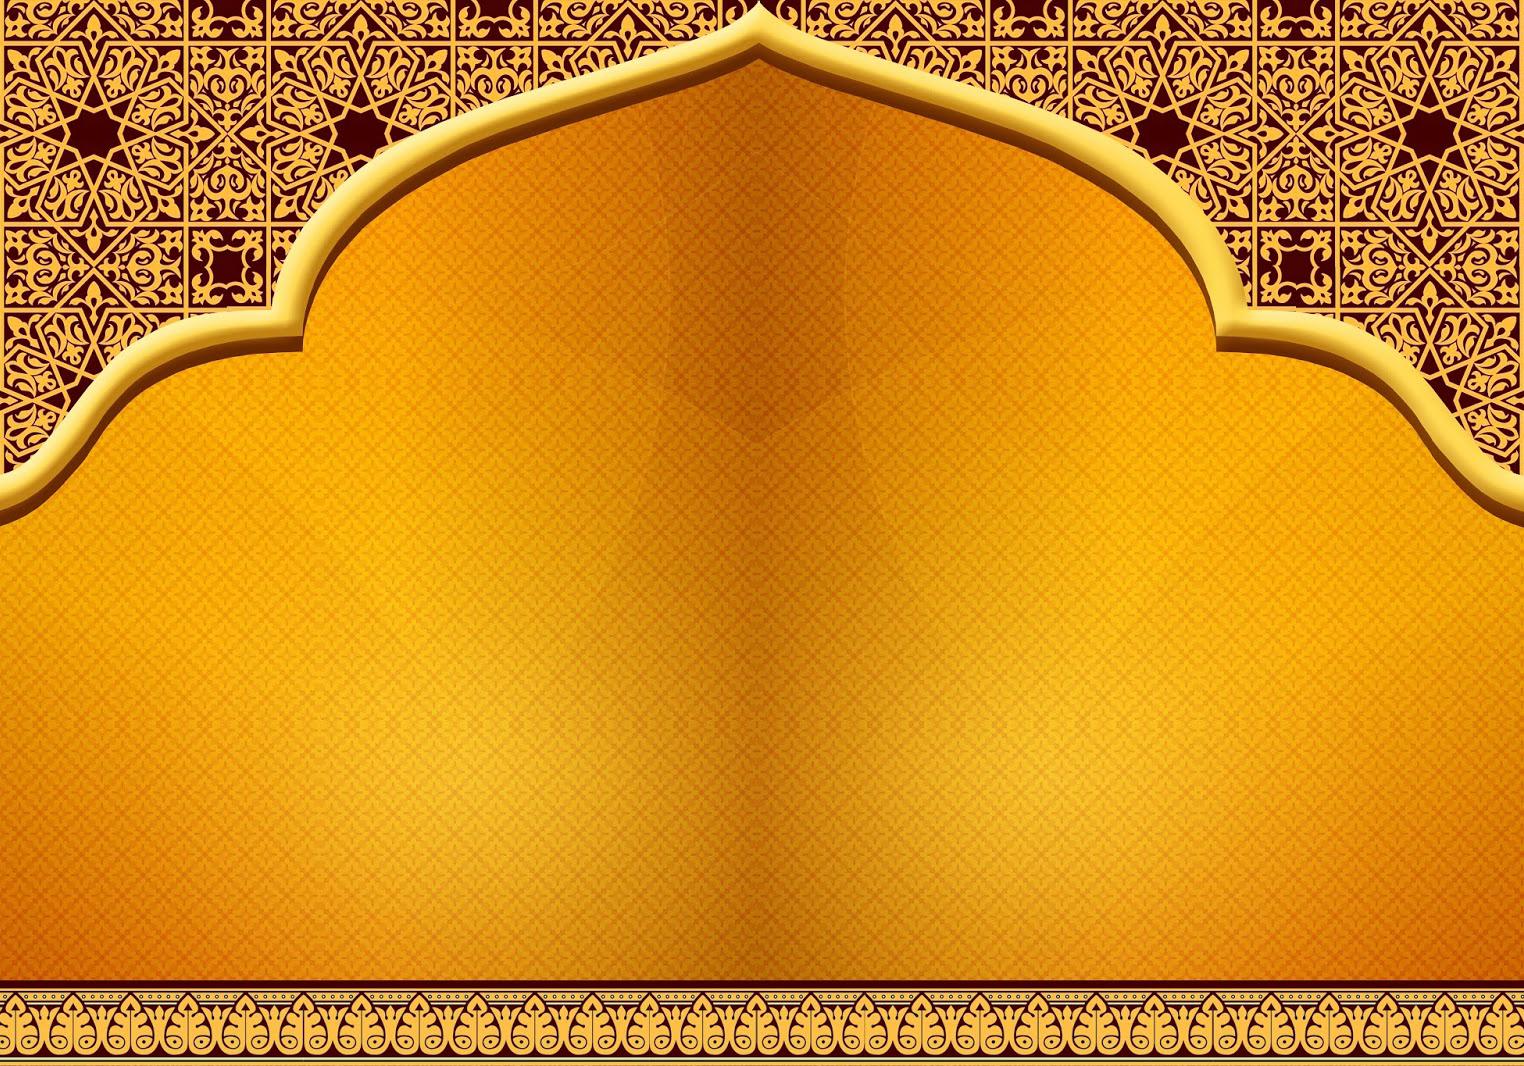 Poster design background hd - Orange Design Free Desktop Hd Wallpaper